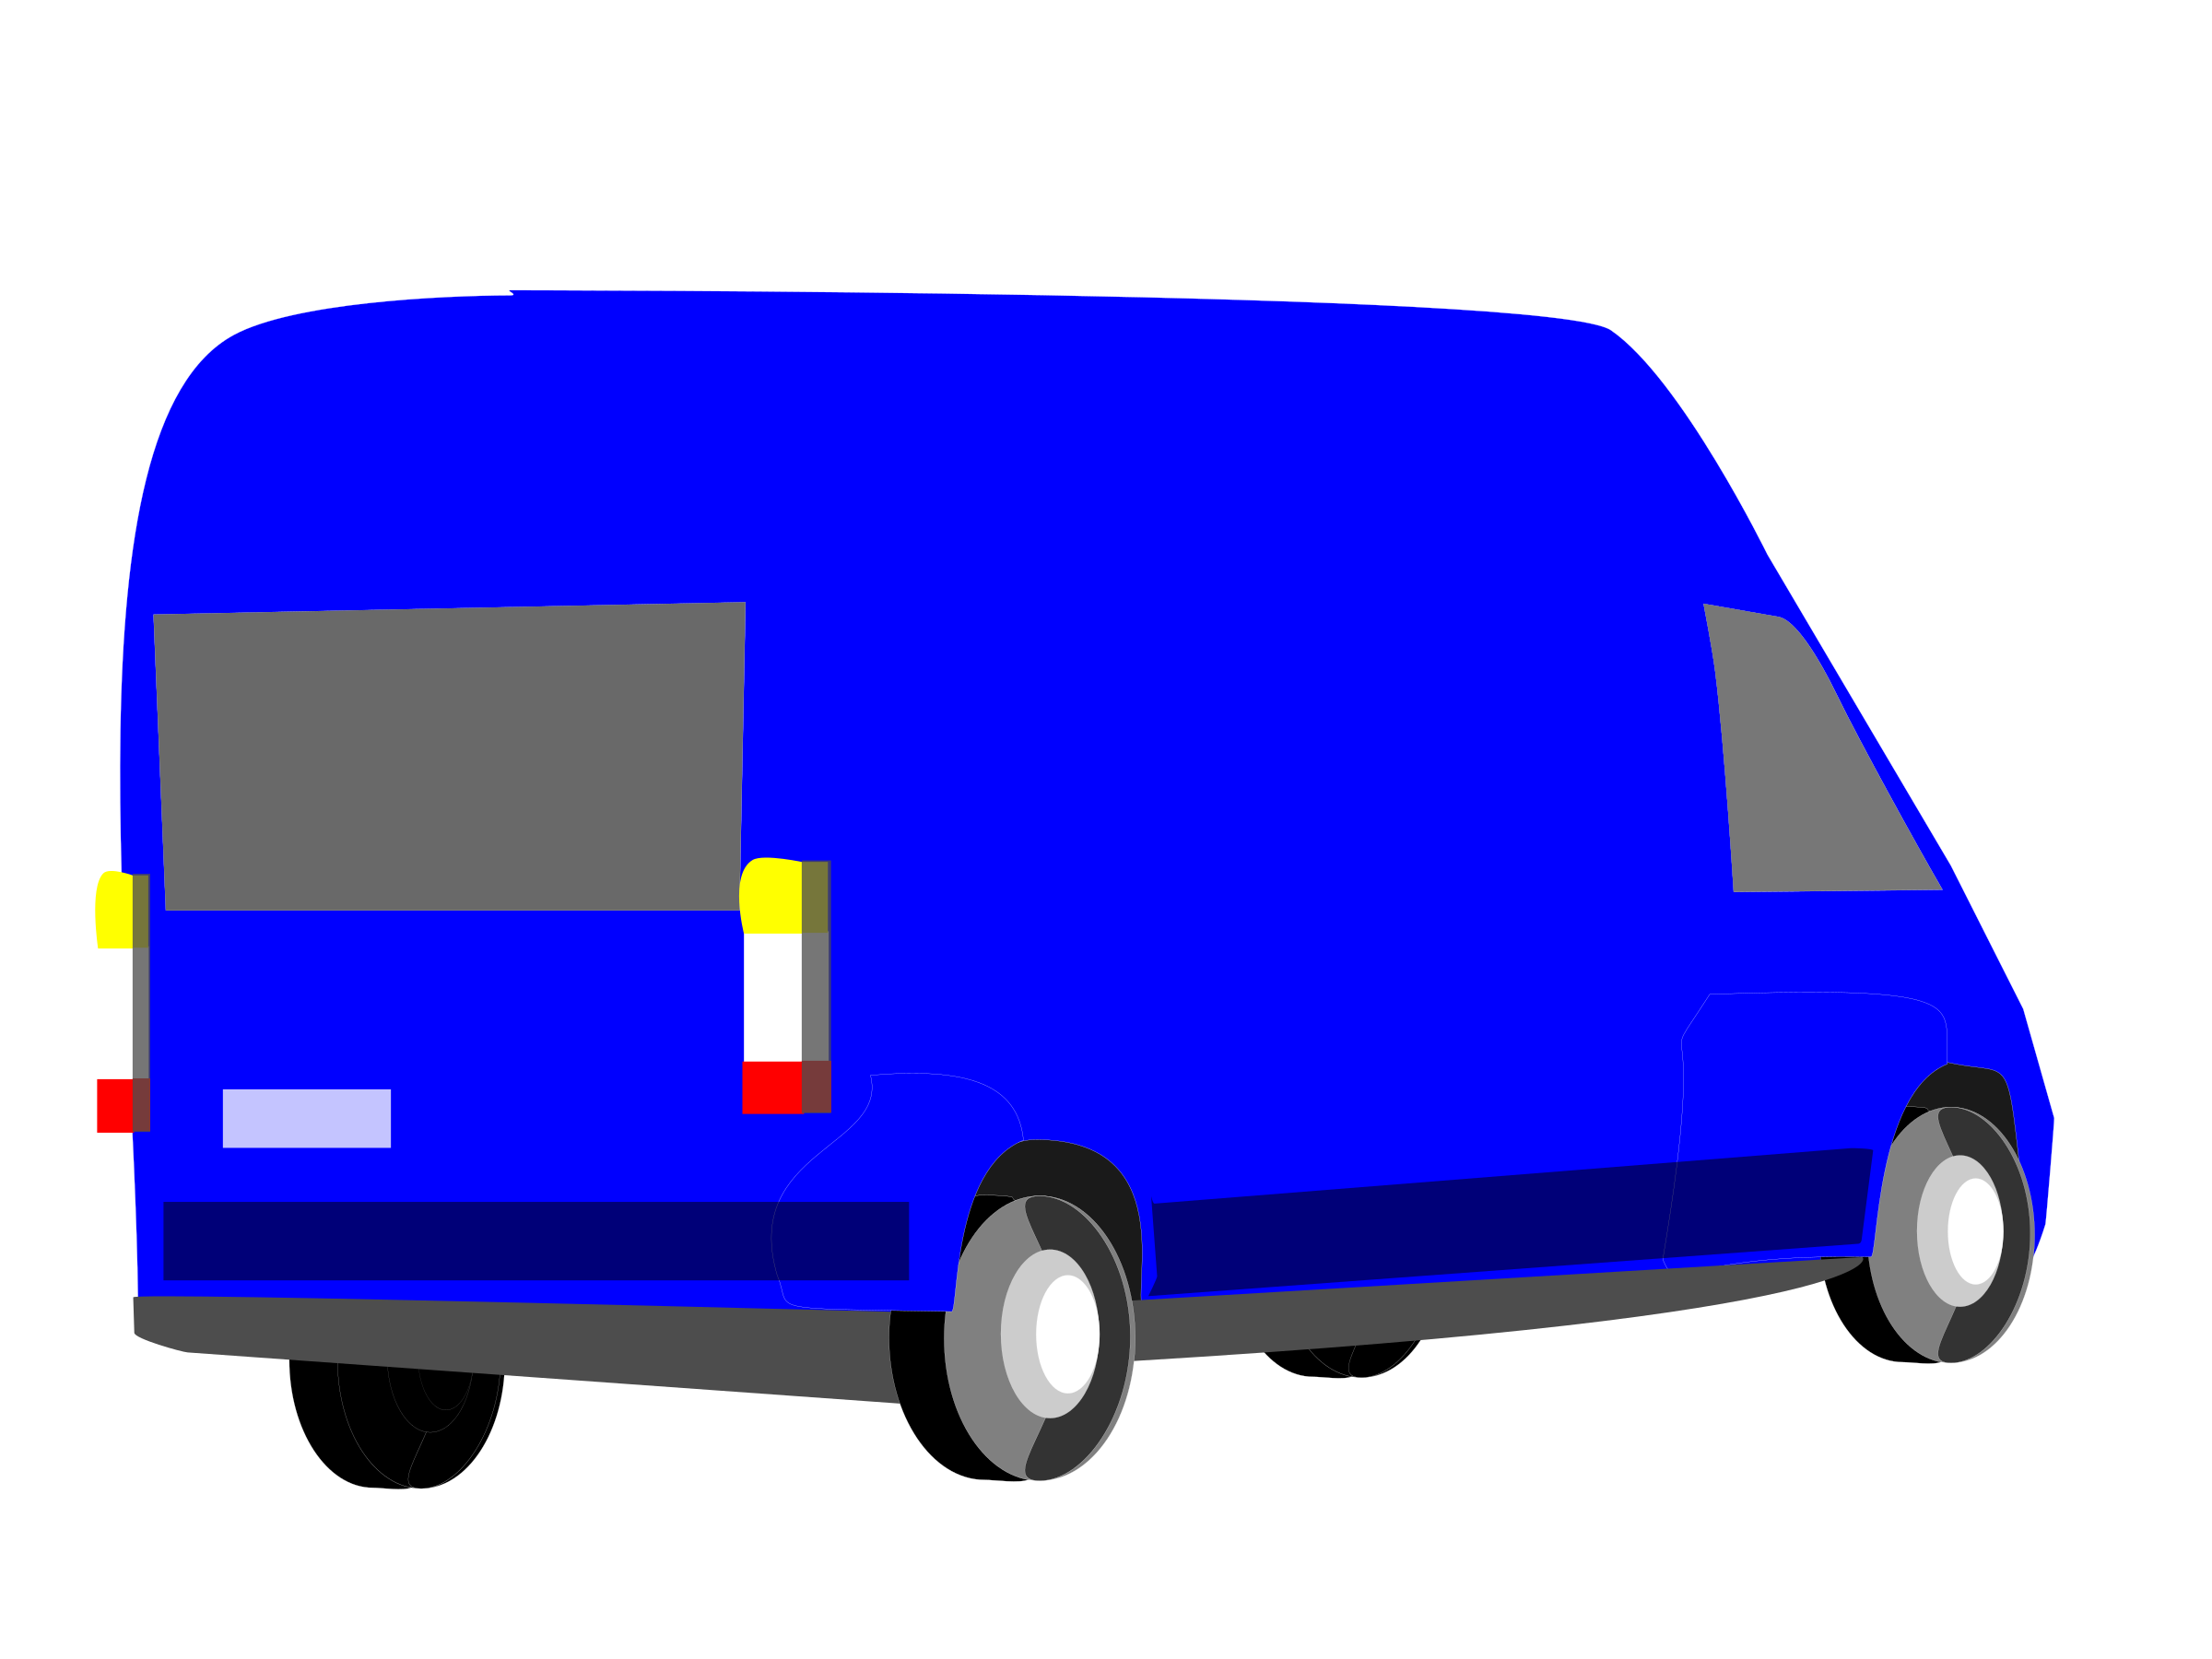 Blue Car clipart blue van Transporter blue Clipart transporter blue